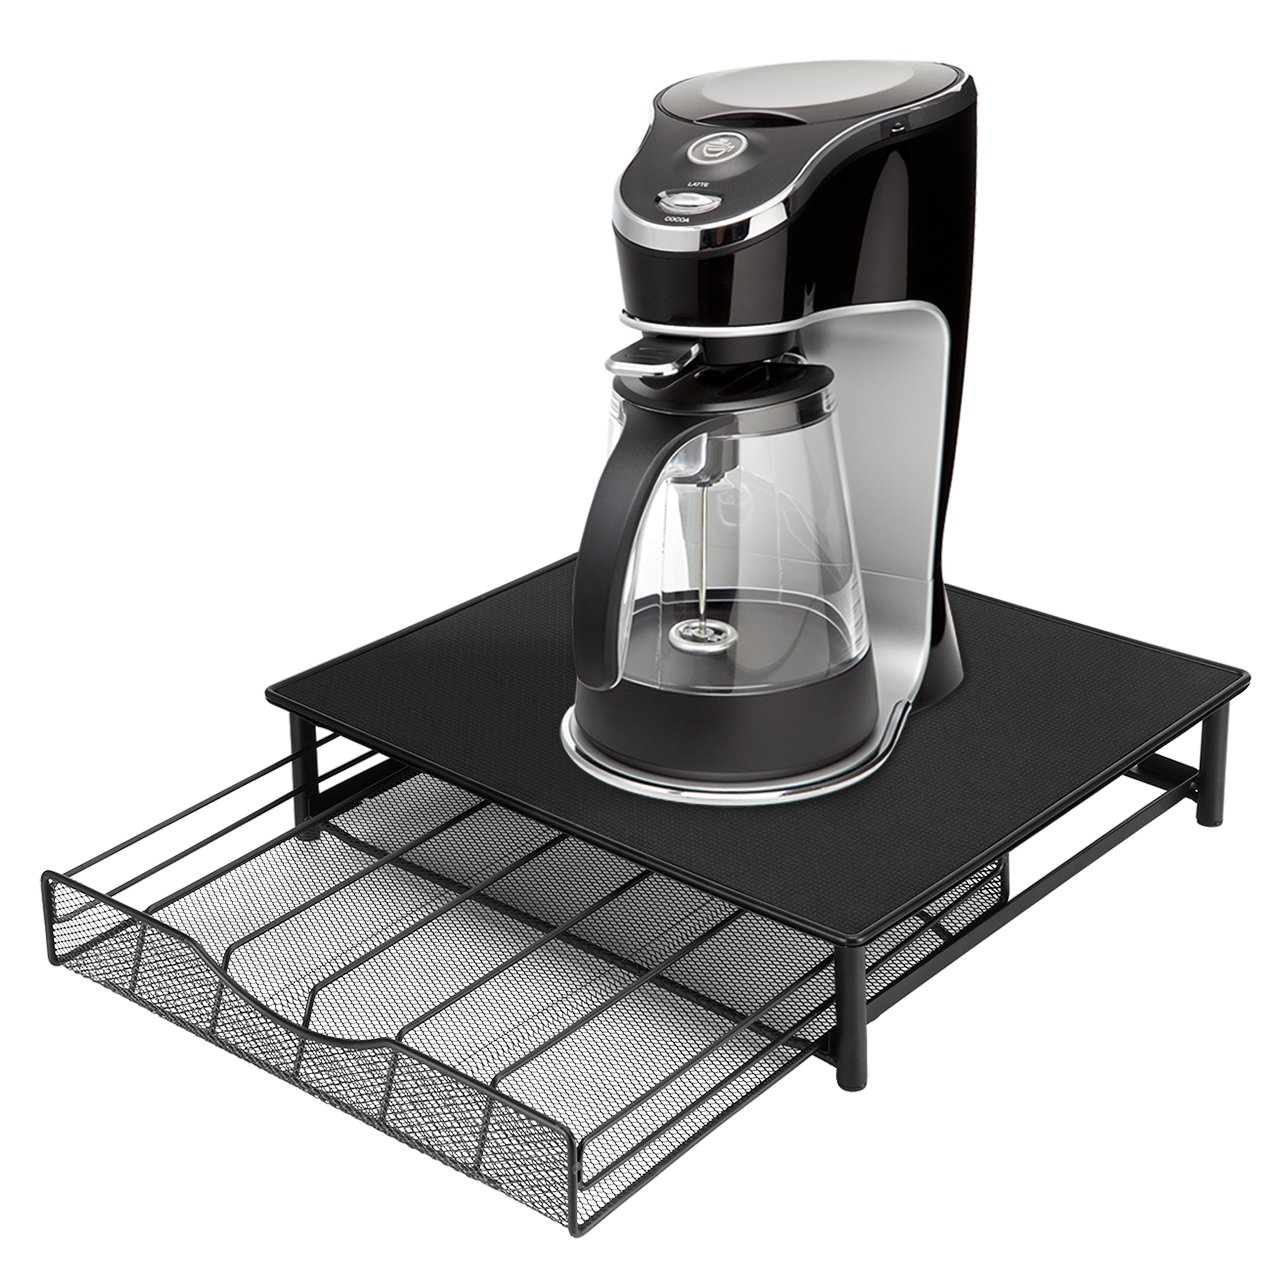 SortWise 36 K-Cup Coffee Pod Holder Storage Drawer Coffee Capsules Organizer Packs, Black